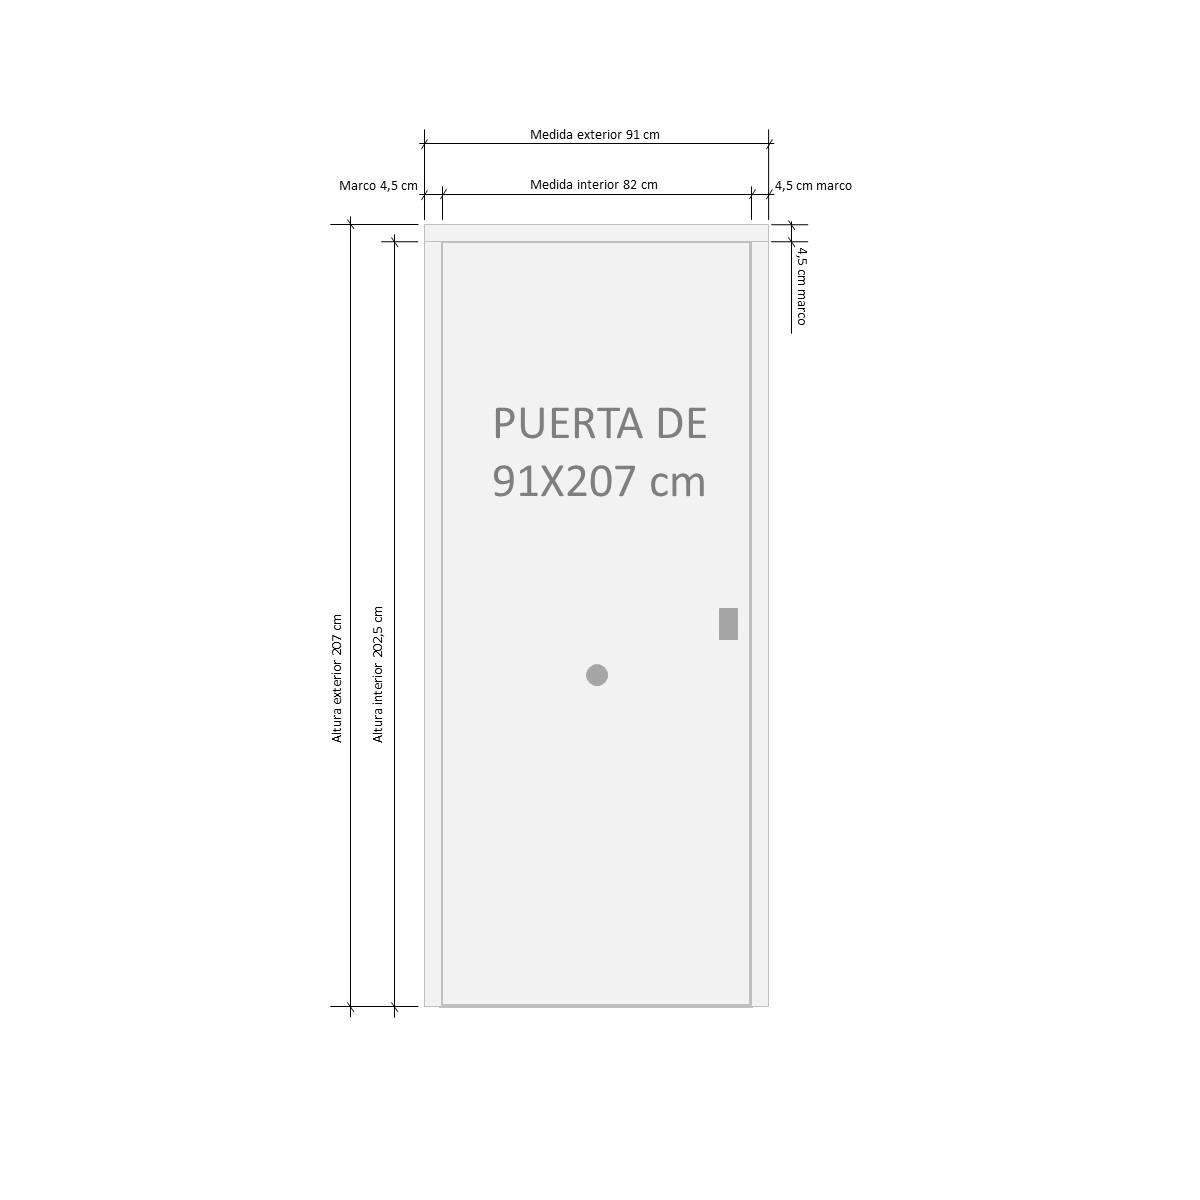 Puerta acorazada Cearco Puertas acorazadas Serie B4-BL